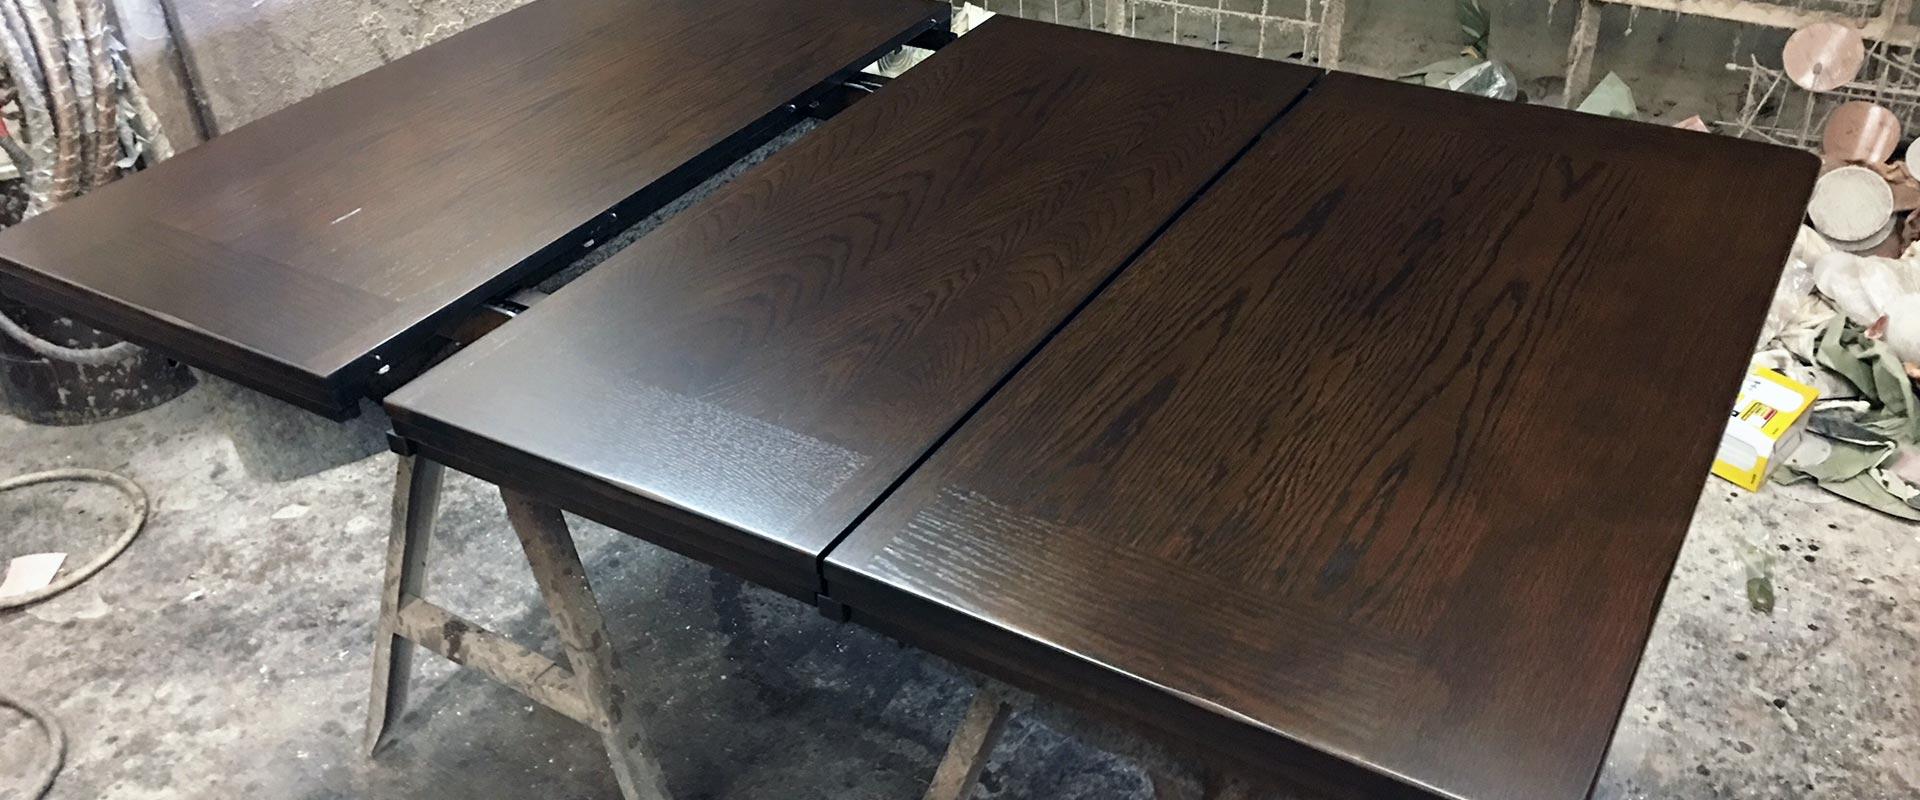 PFR-progressive-furniture-refinishing-grand-rapids-mi_slide3